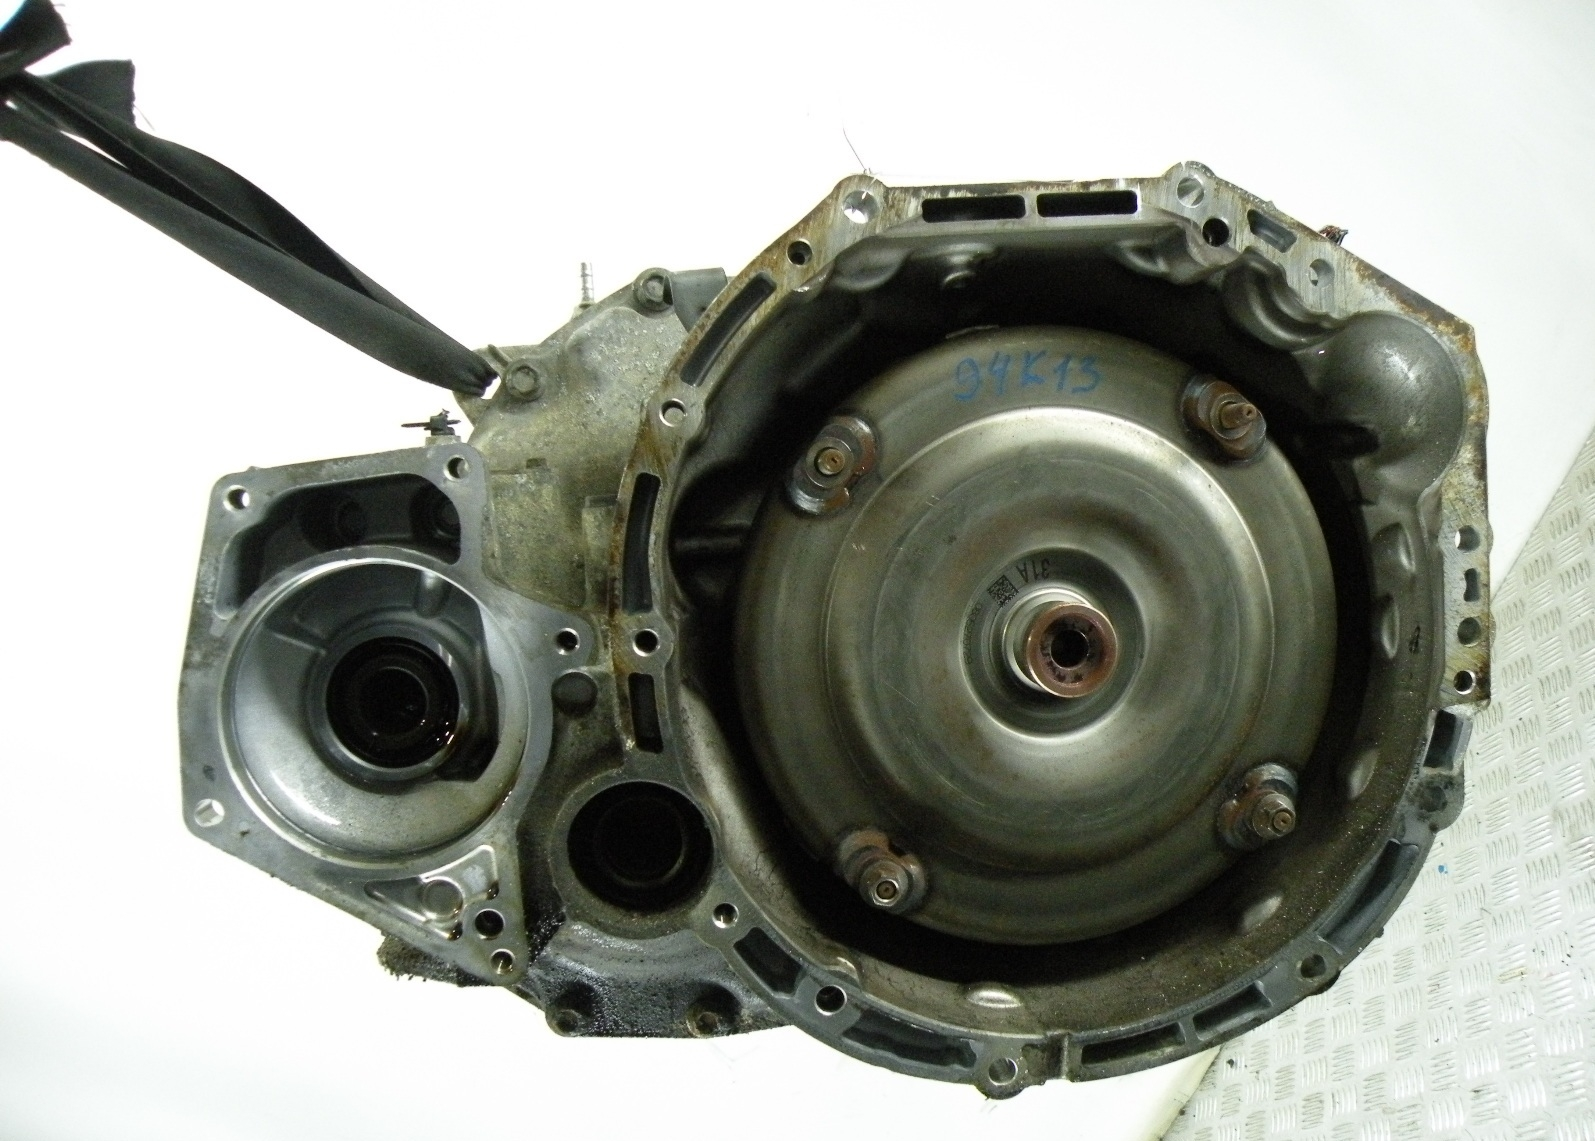 КПП автоматическая, NISSAN, X-TRAIL T31, 2008